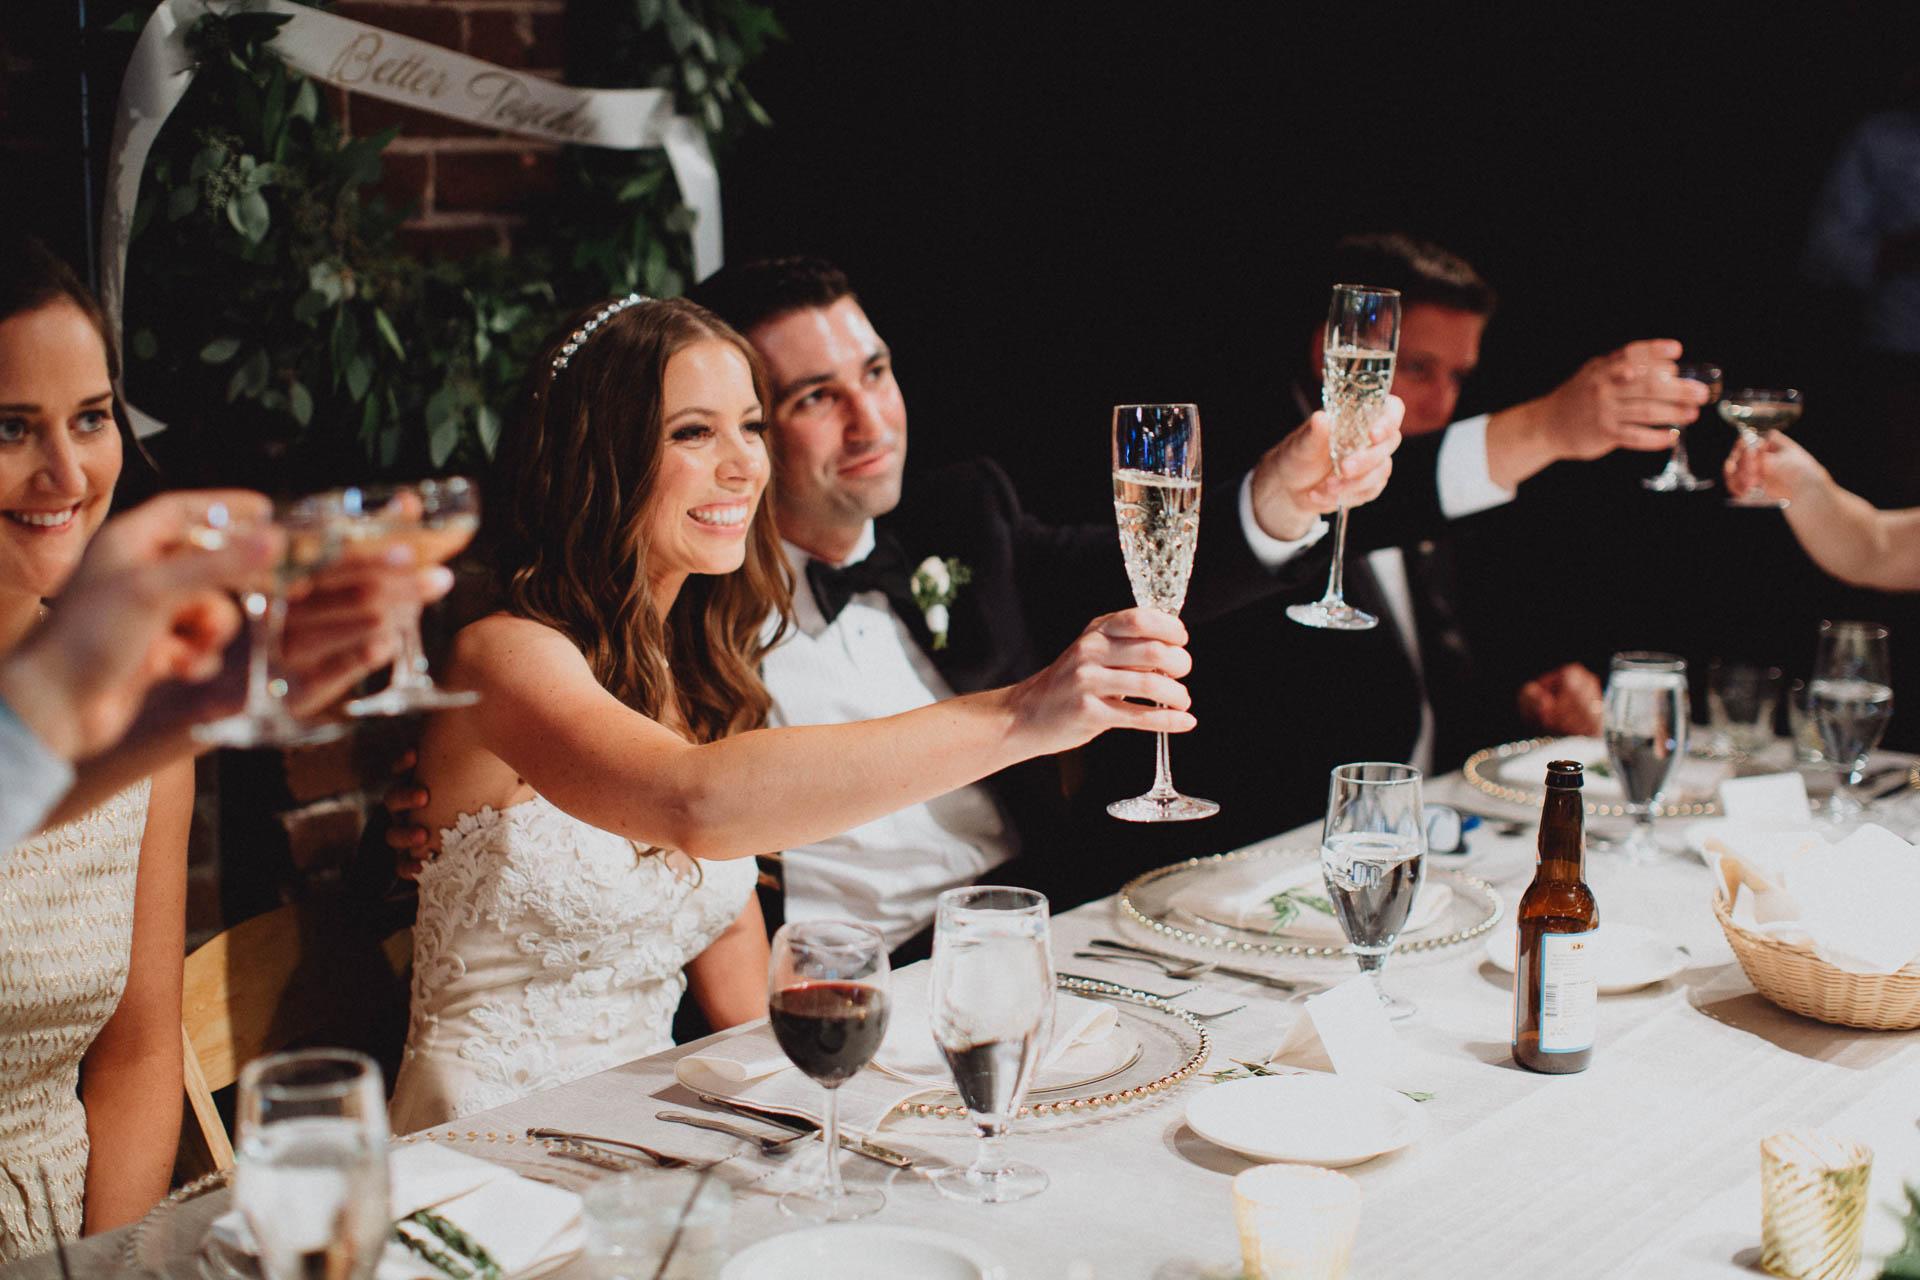 Keri-Joseph-Top-of-the-Market-Wedding-182@2x.jpg